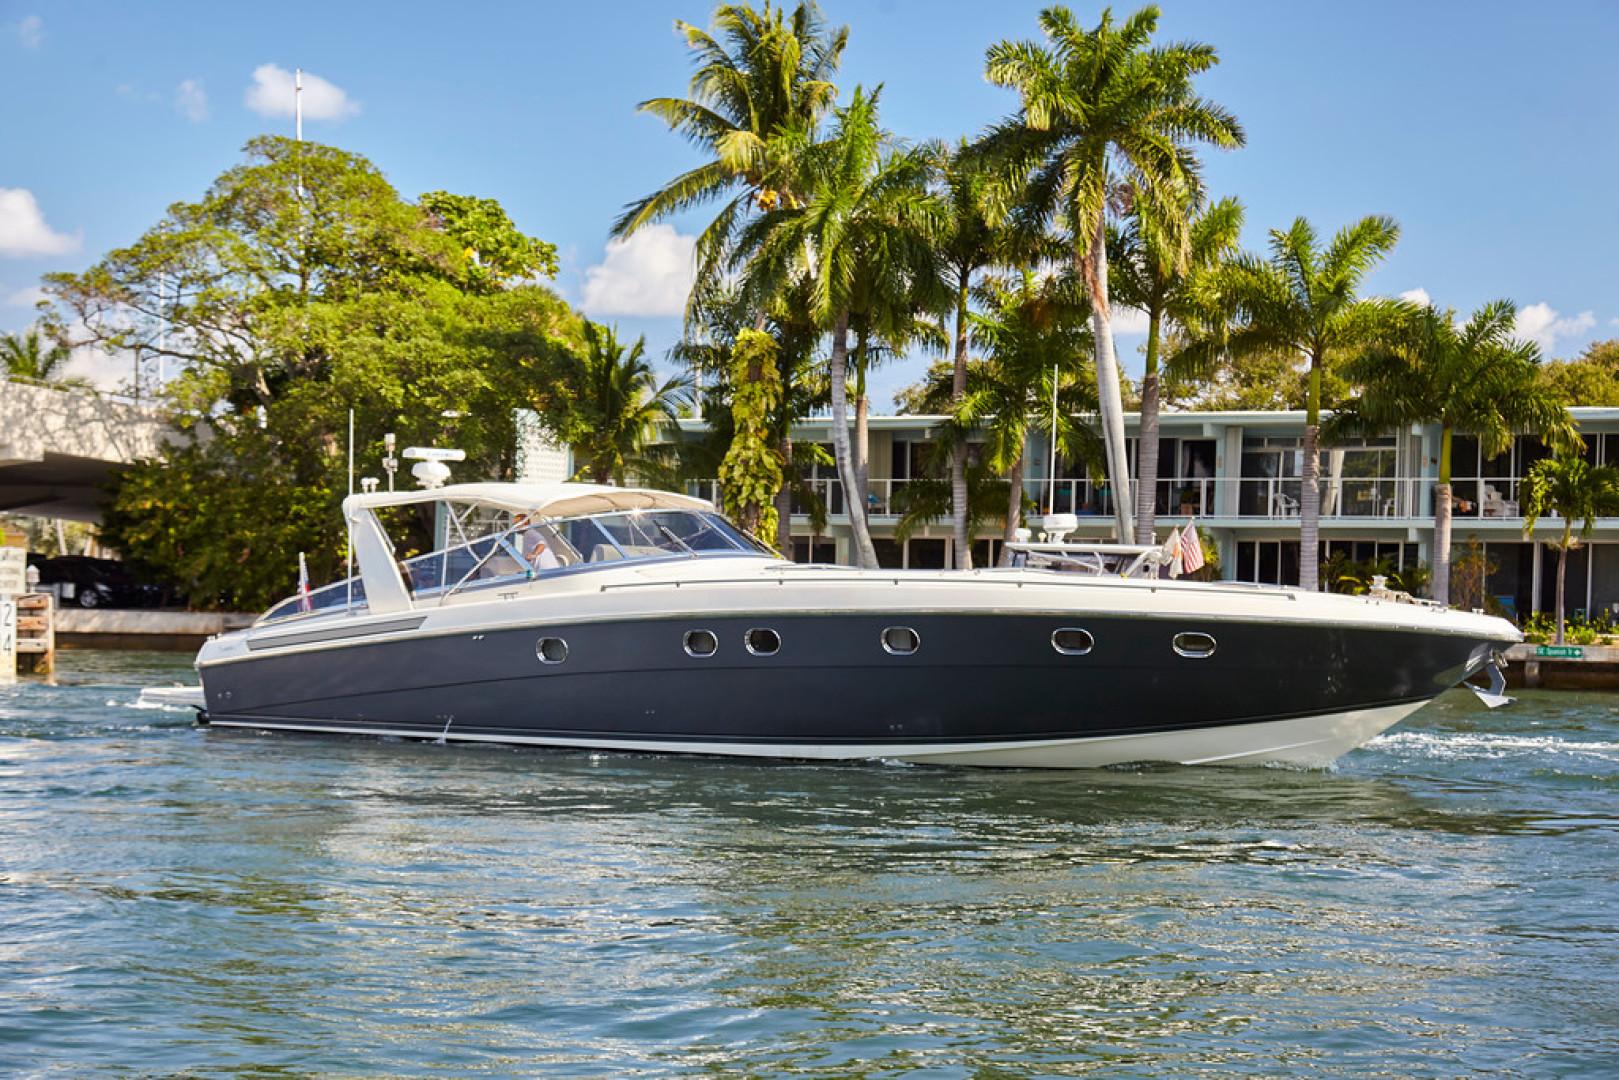 Baia-Sports Cruiser 1998 -Fort Lauderdale-Florida-United States-1275570 | Thumbnail